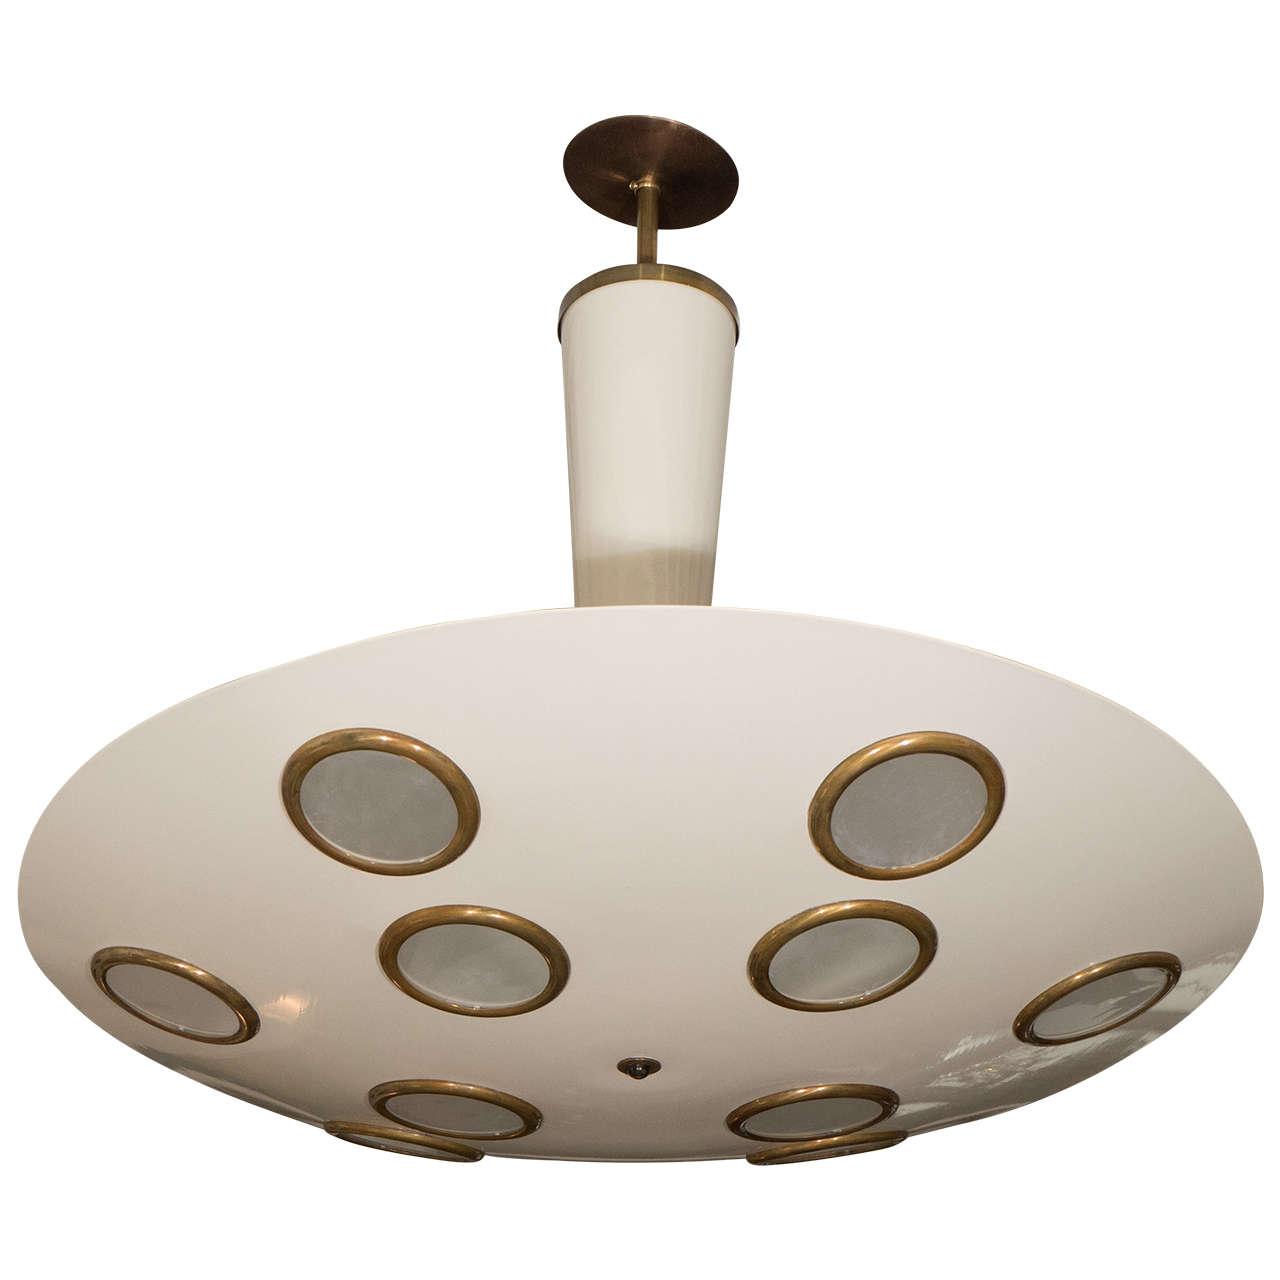 Lumen Italian 1950s Light Fixture With Circular Designs At